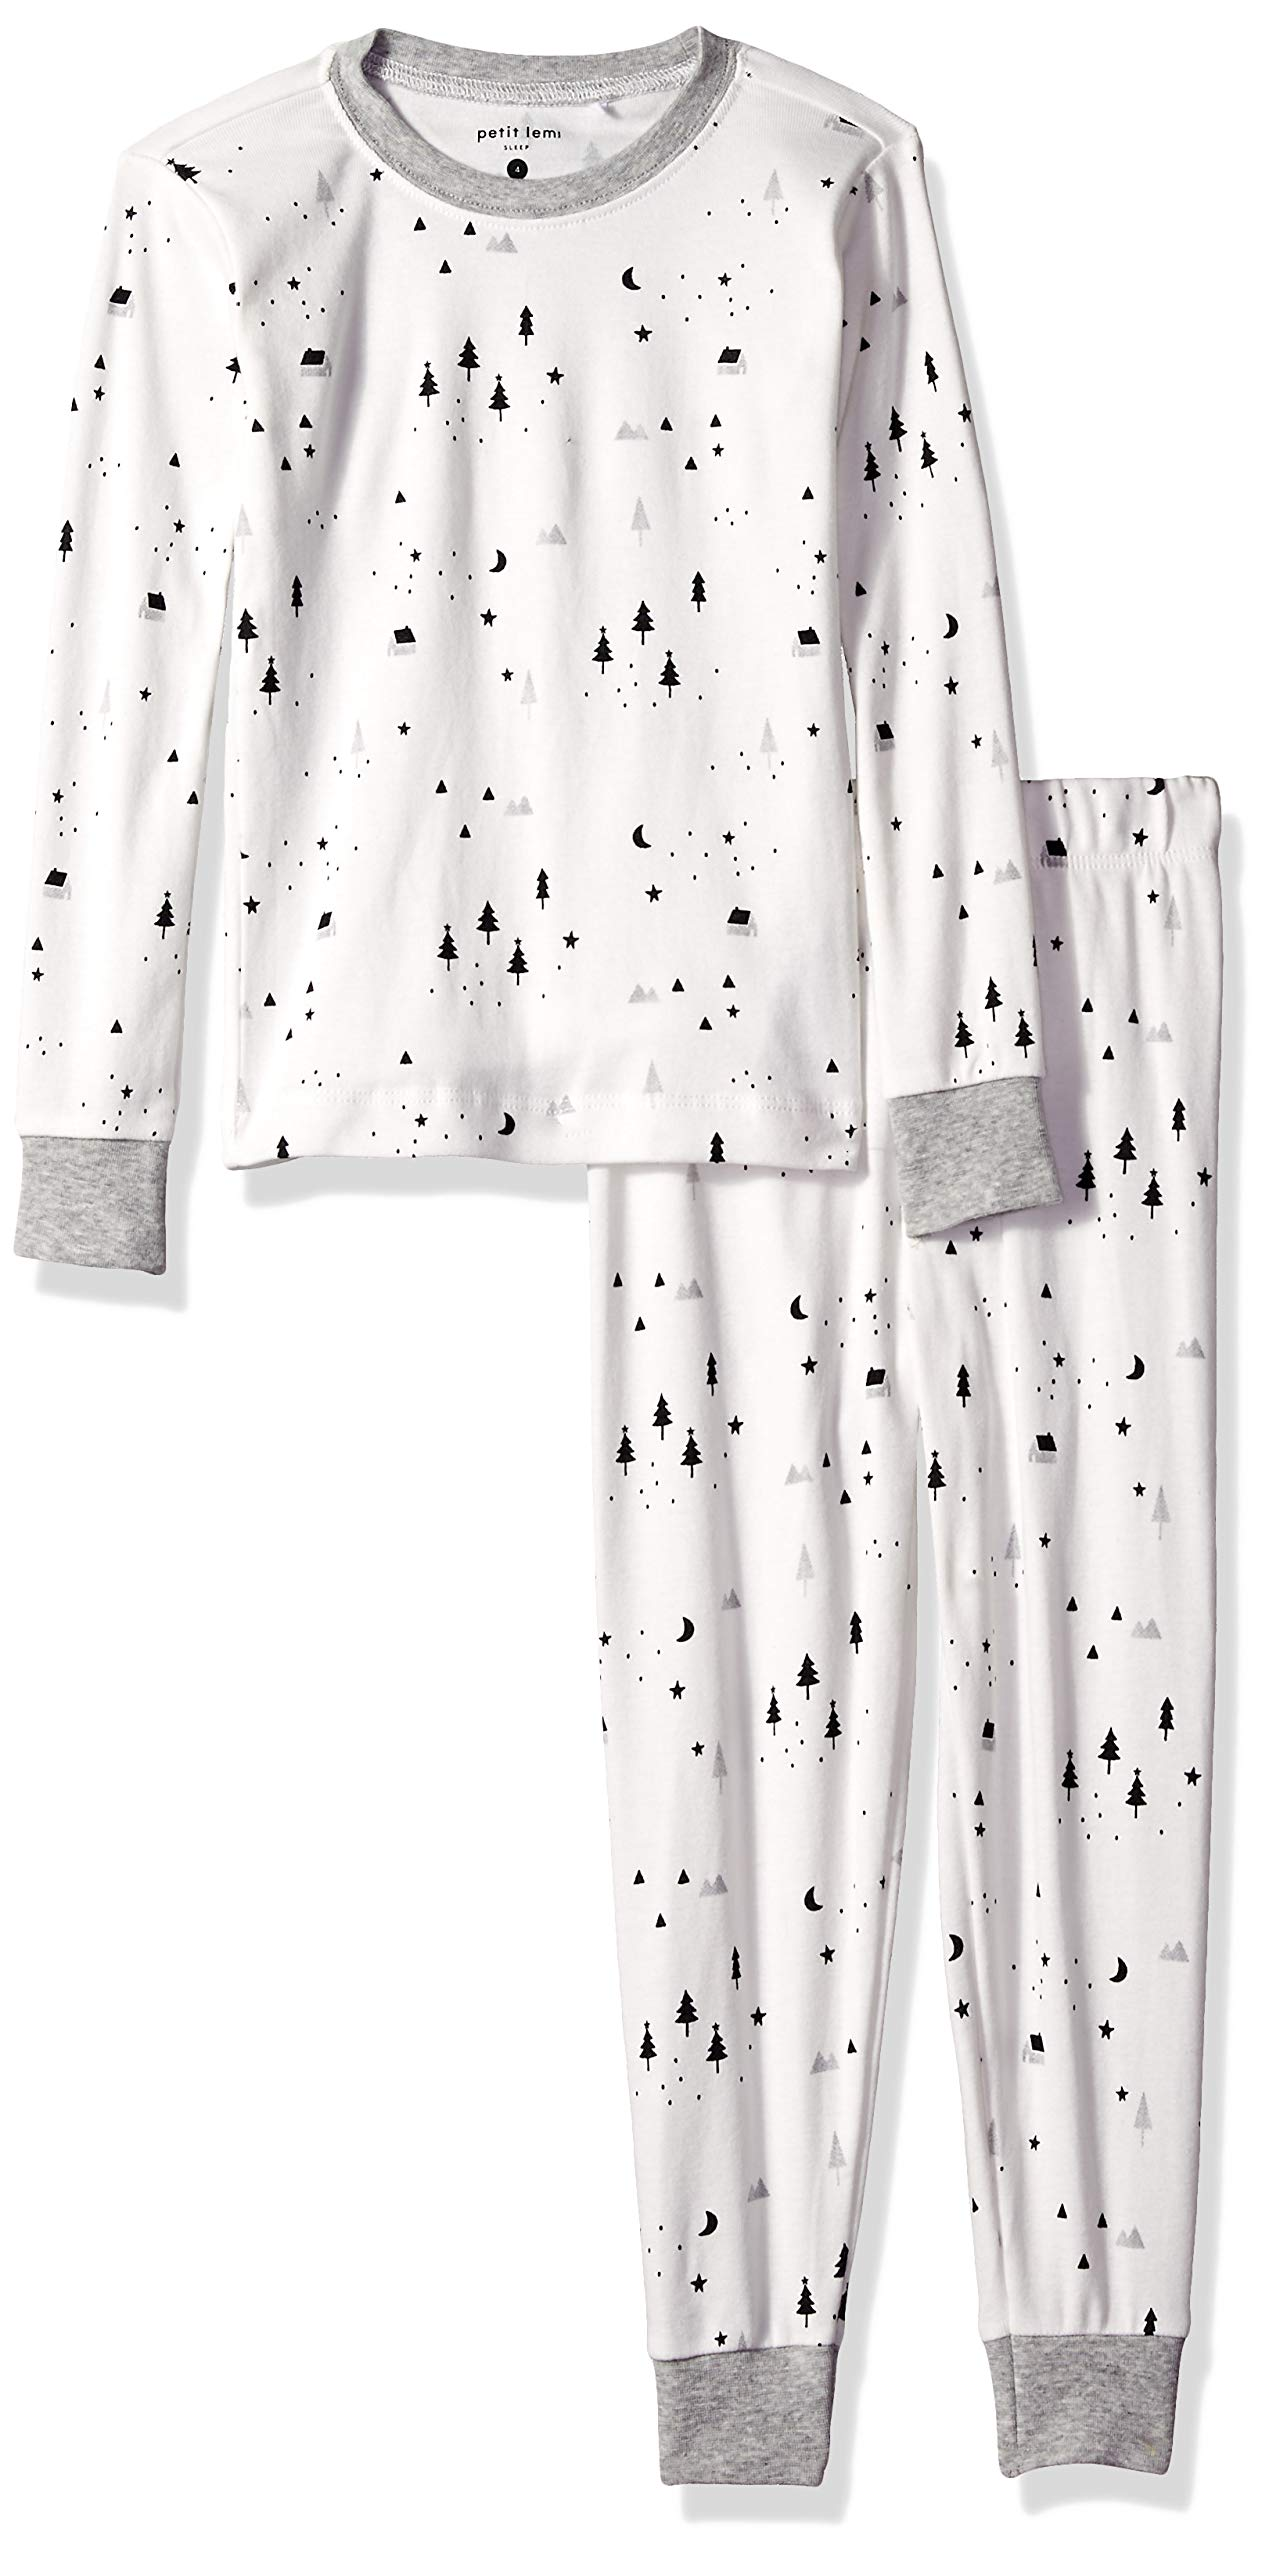 Petit Lem Kids' Little Holiday Unisex 2-Pc Pajama Set, Comfy, Cute & Cozy, Off White, 7 by Petit Lem (Image #1)